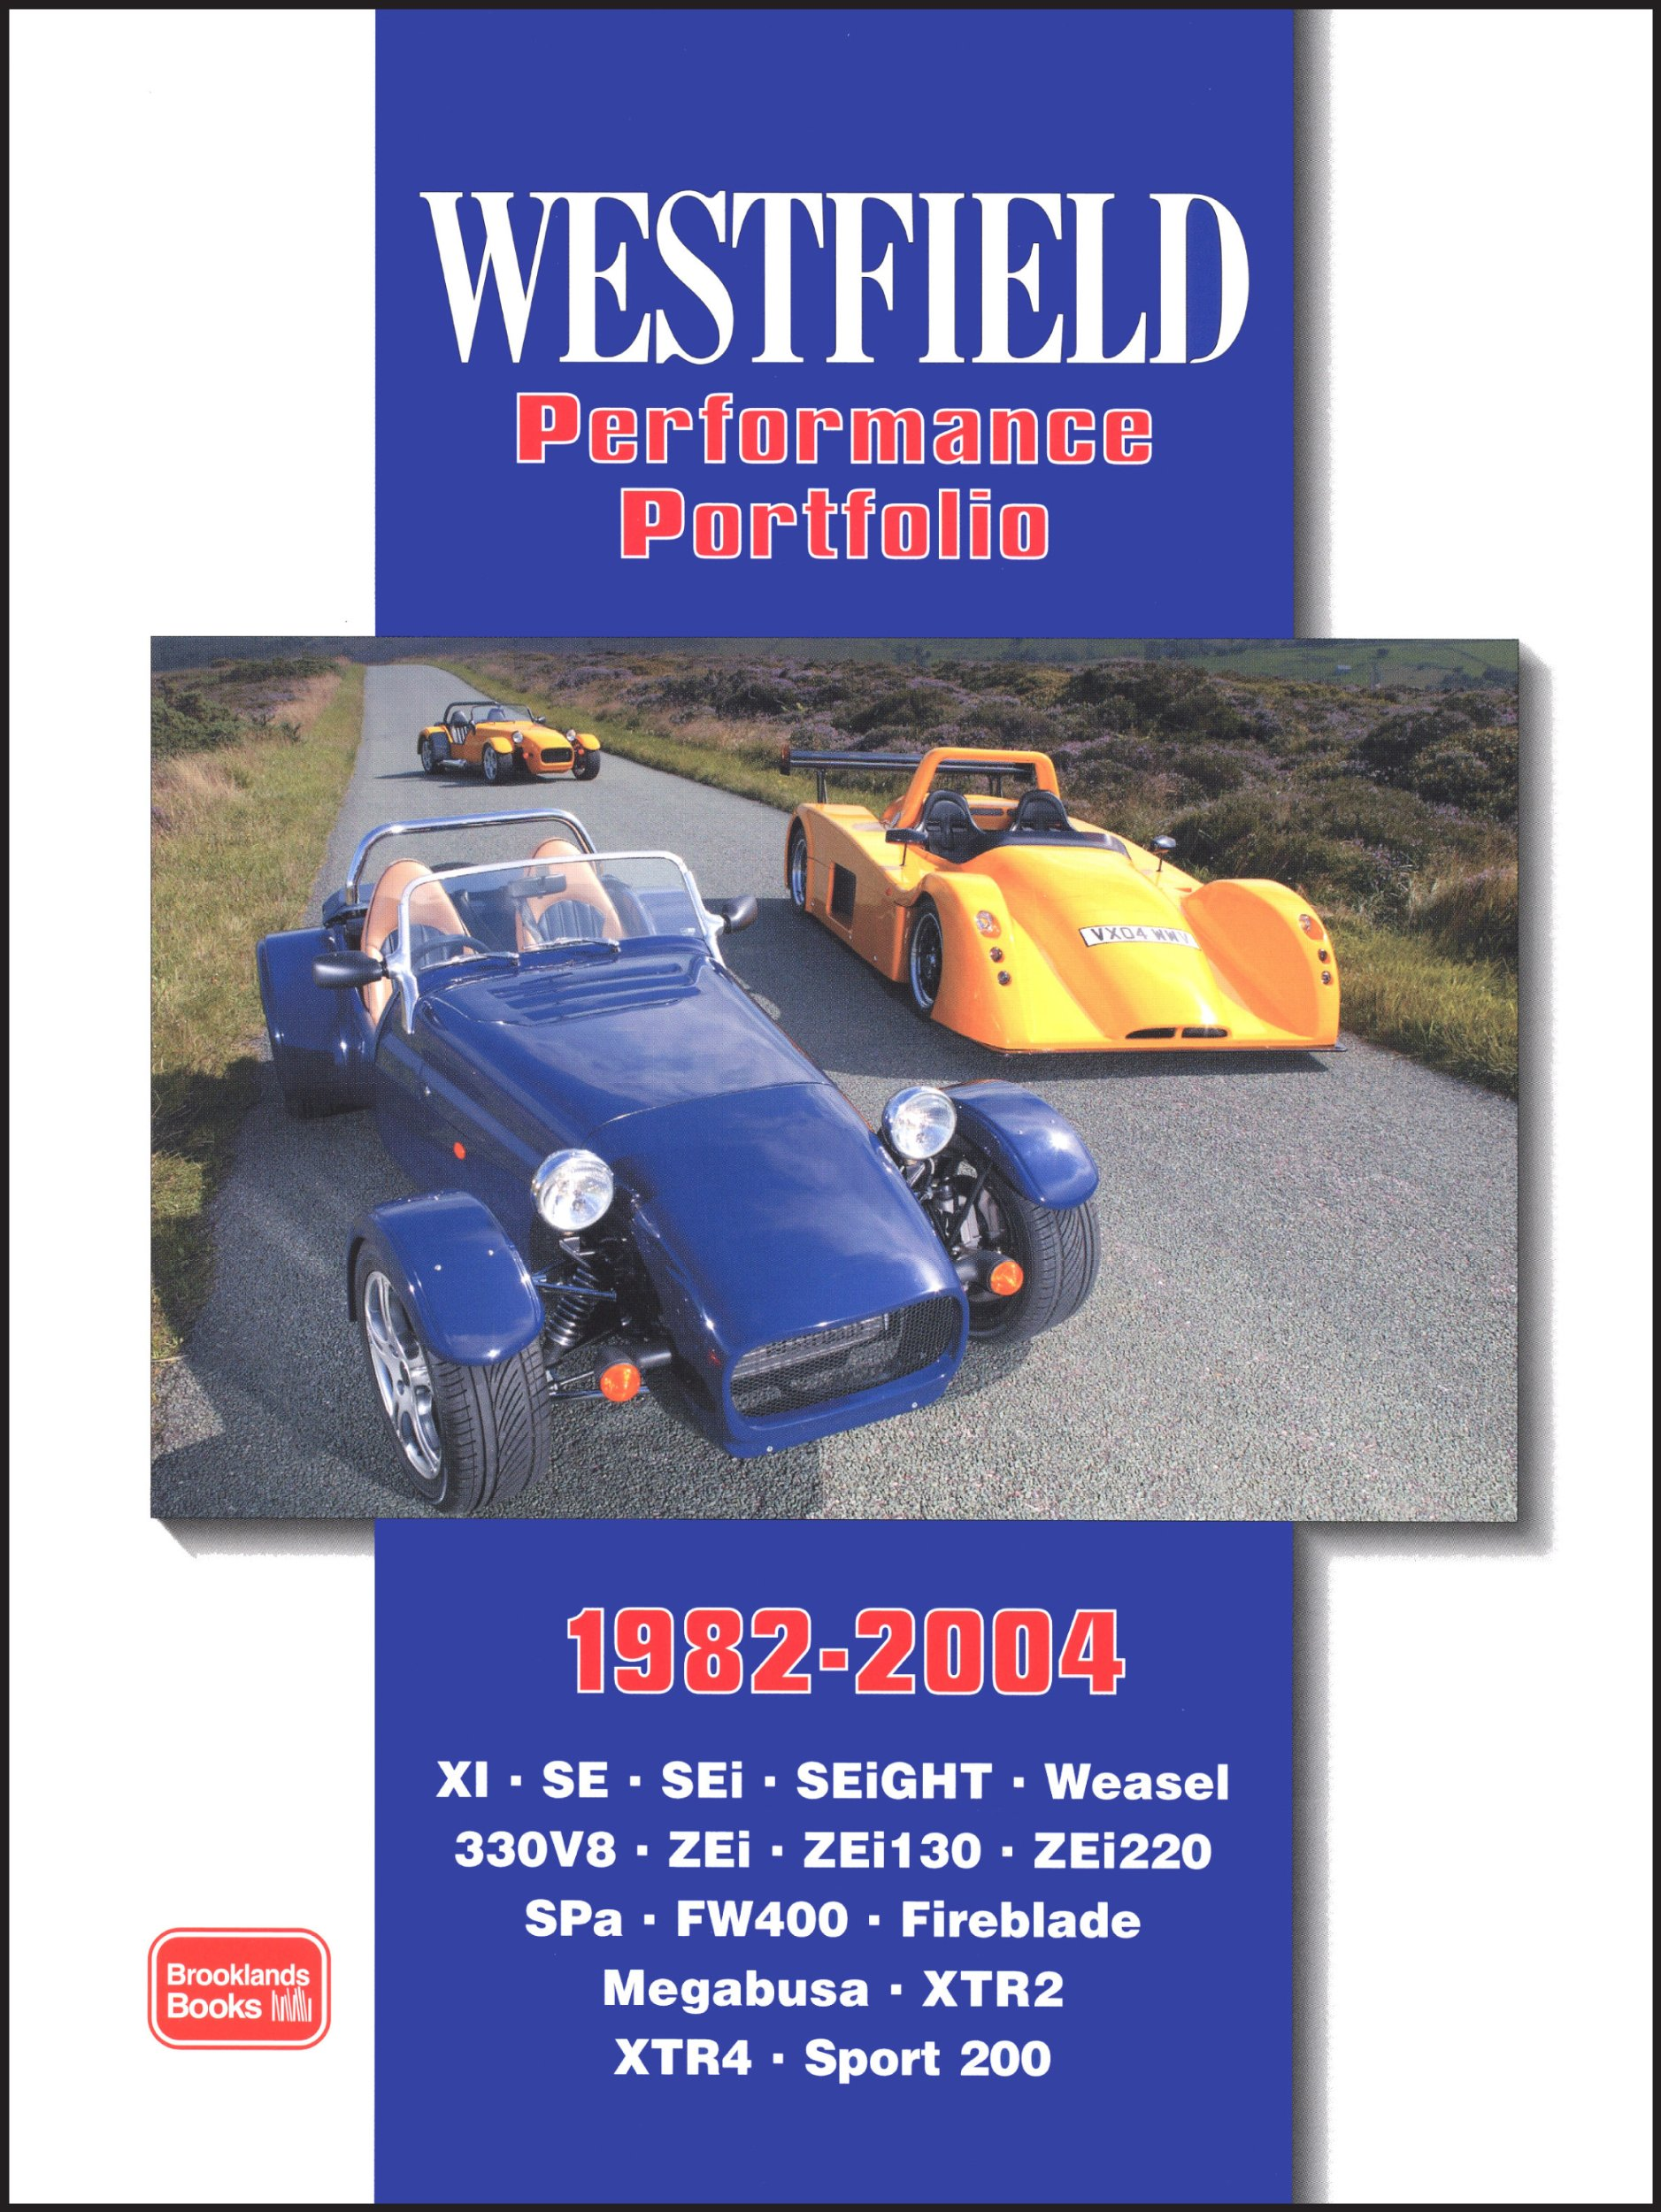 Westfield Performance Portfolio 1982-2004 (Brooklands Books